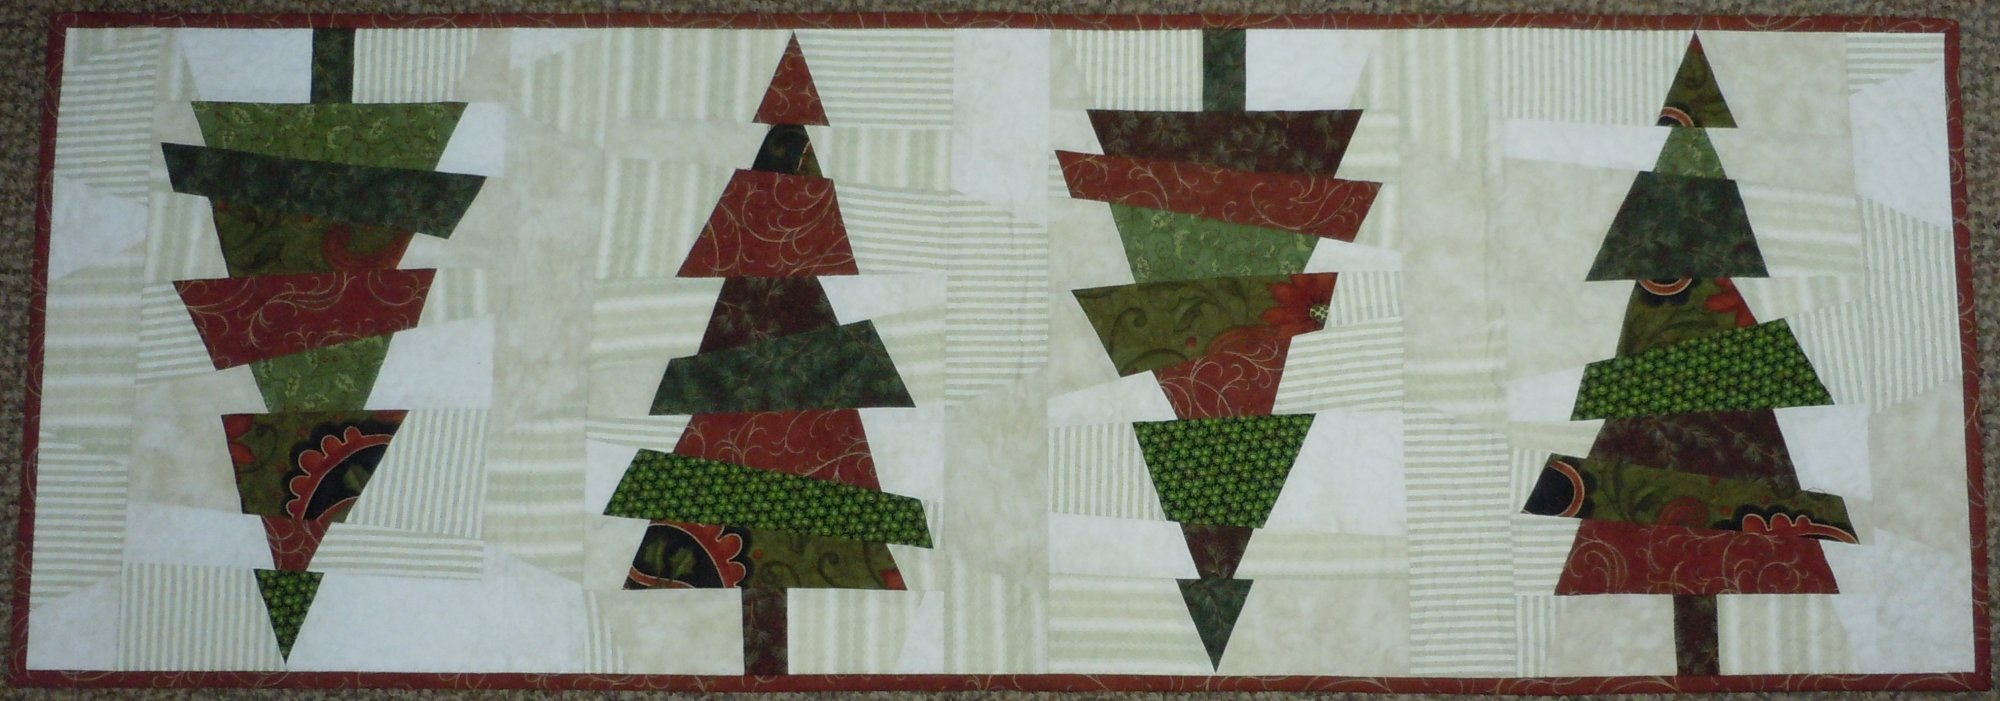 Kit-Crazy Christmas Trees TR 15-1/2W x 45L